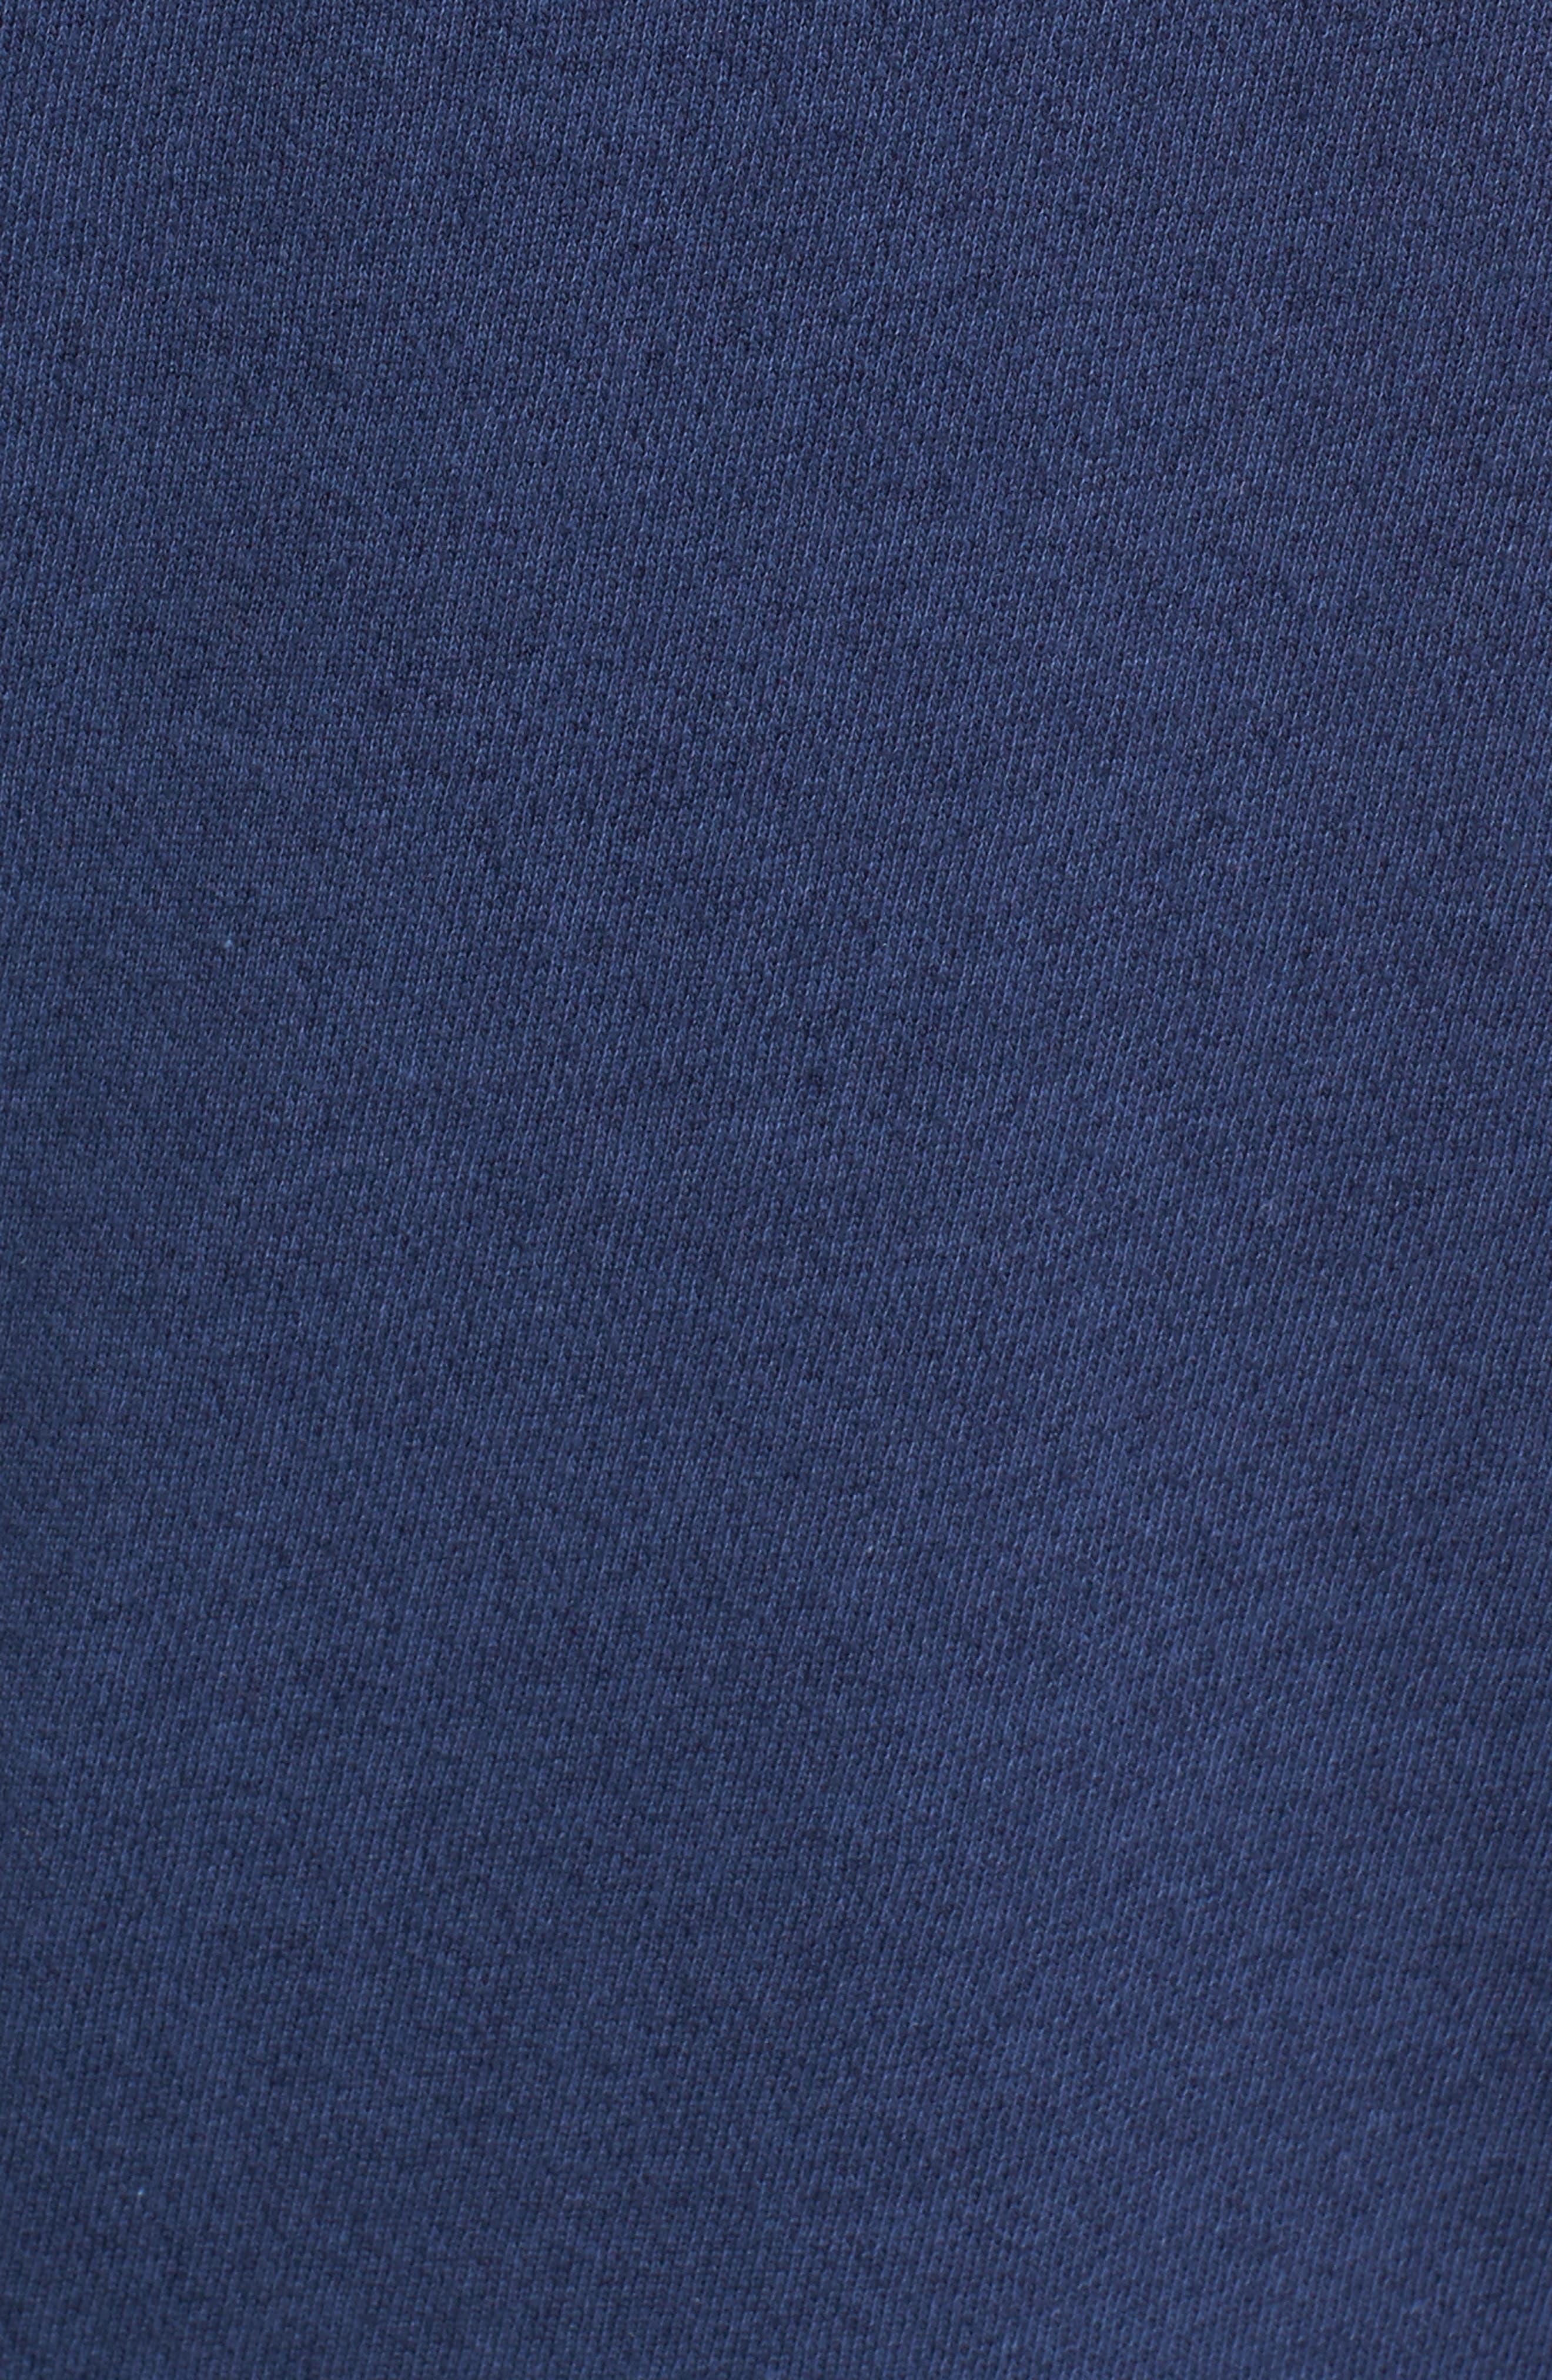 Print Detail Pocket Sweatshirt,                             Alternate thumbnail 5, color,                             Navy